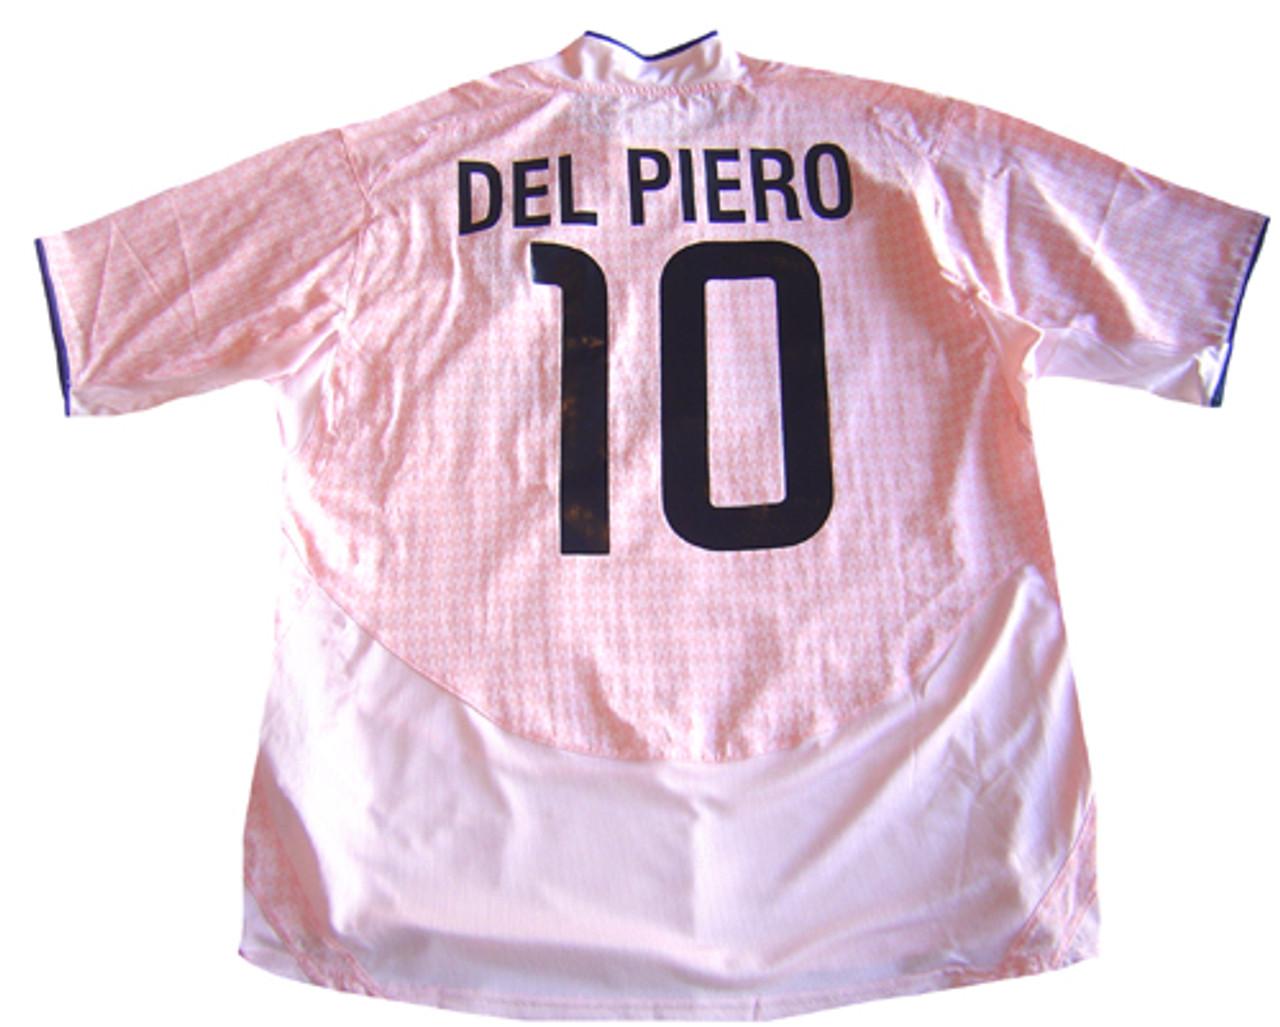 new product eee67 7c232 NIKE JUVENTUS 2005 AWAY `DEL PIERO` JERSEY PINK